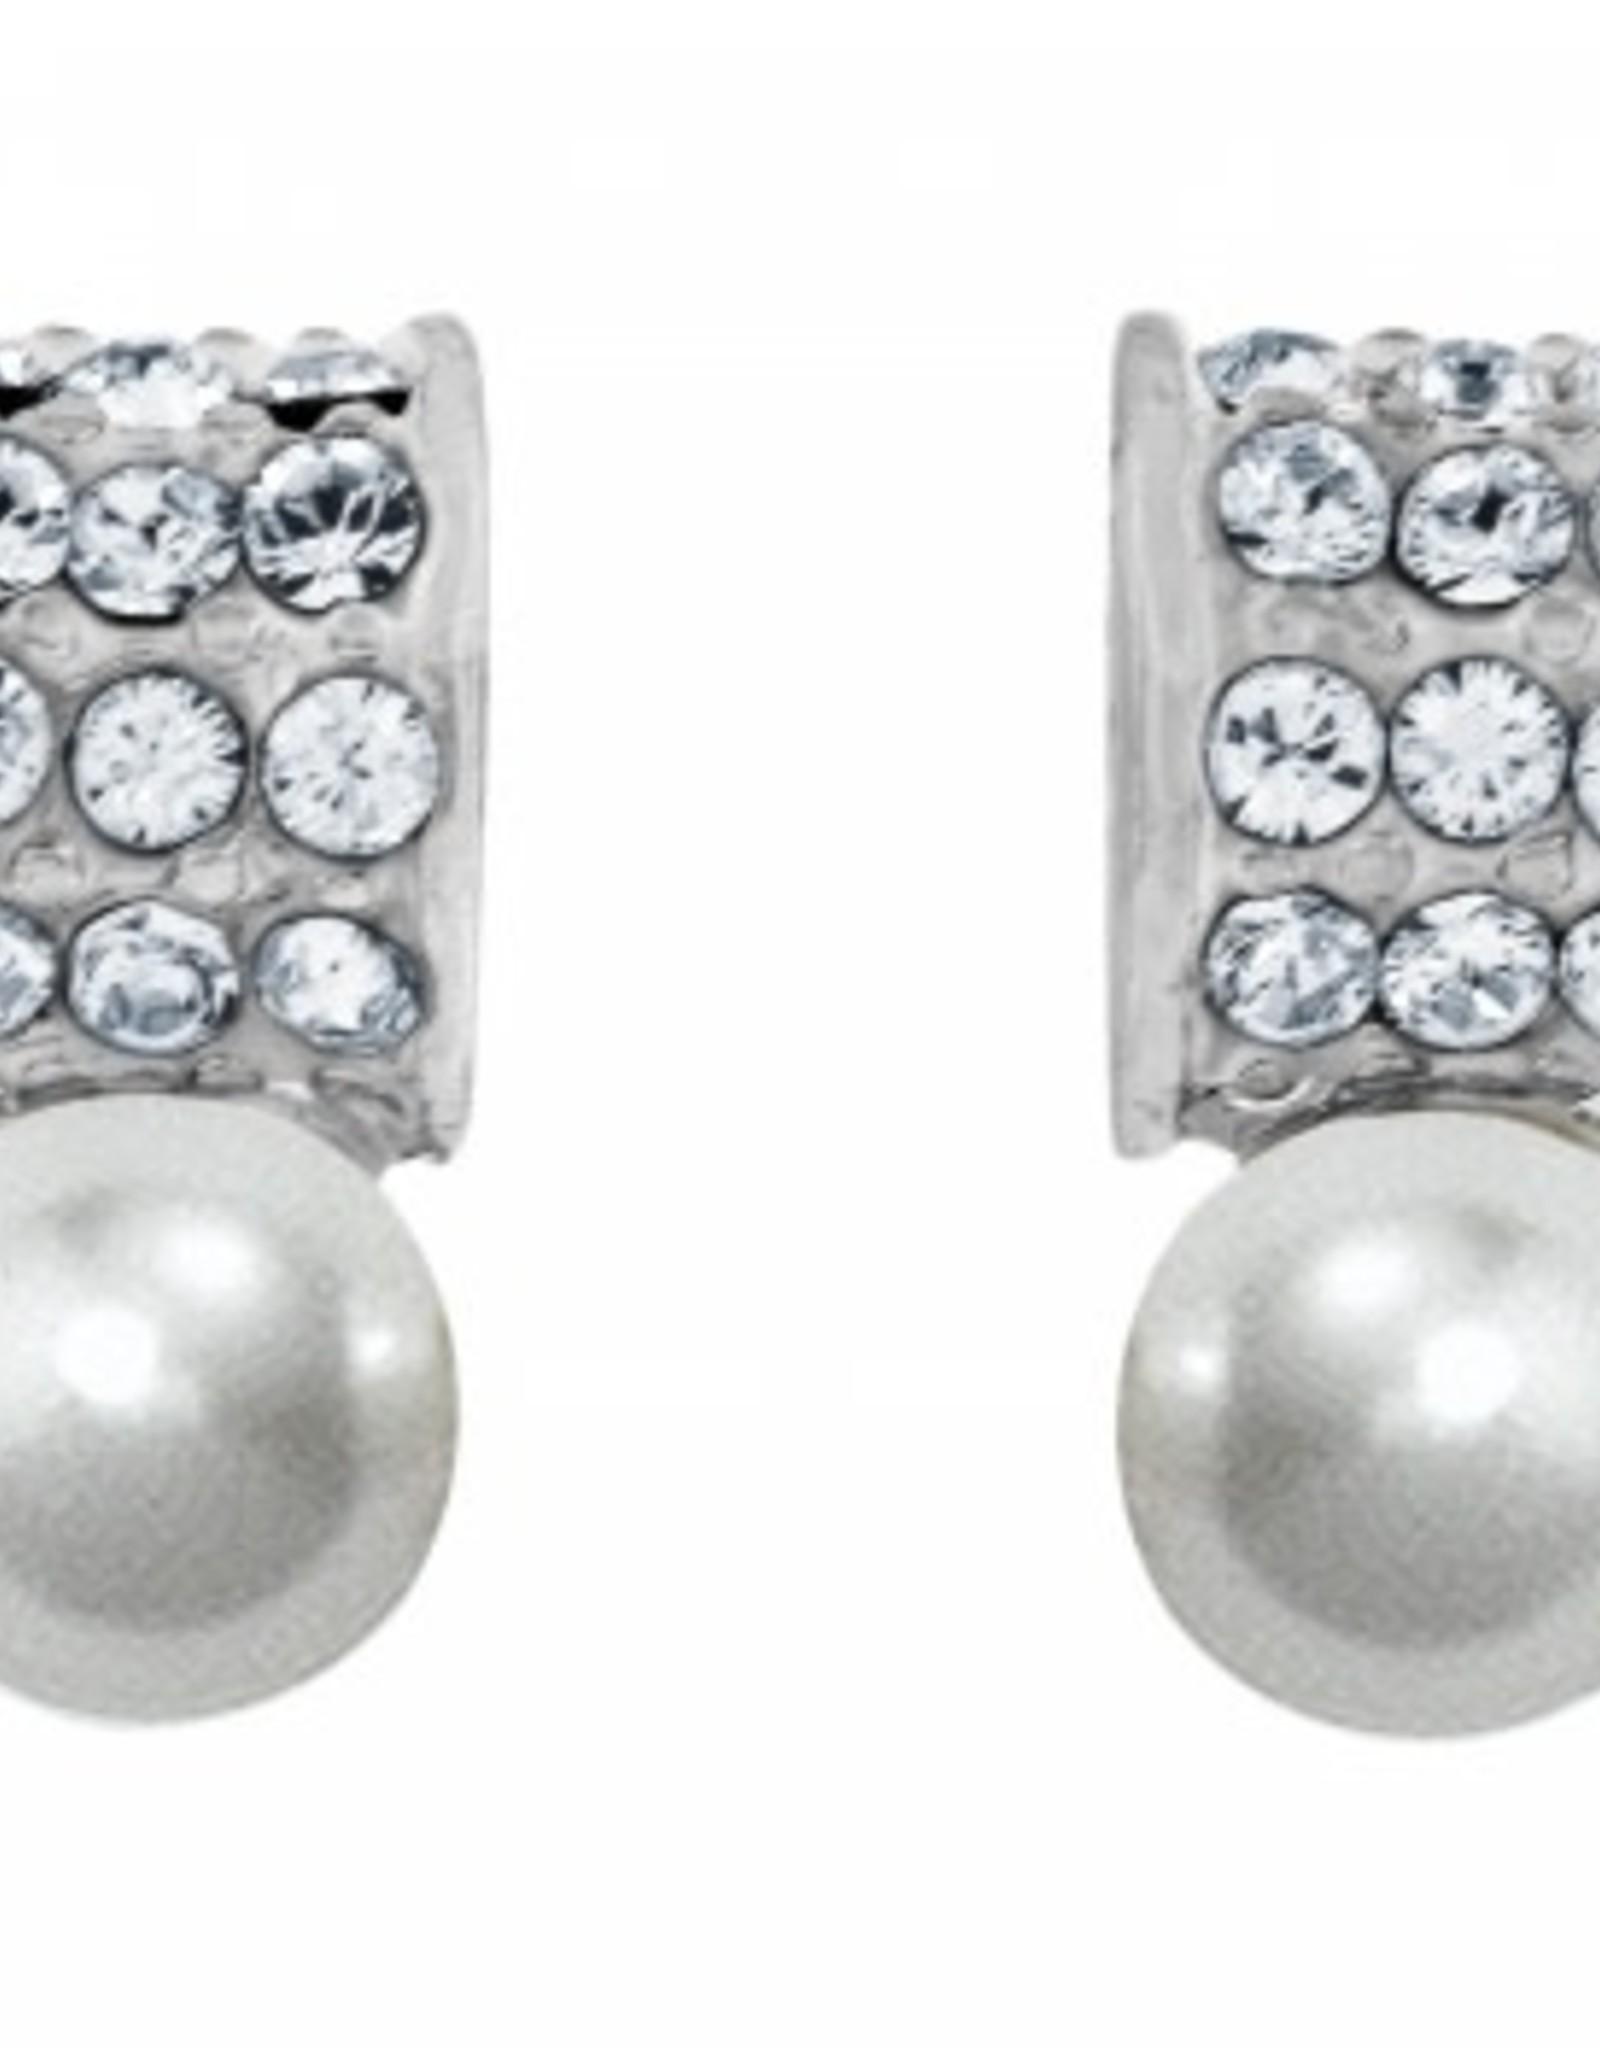 Brighton Brighton, Meridian Petite Pearl Post Earrings